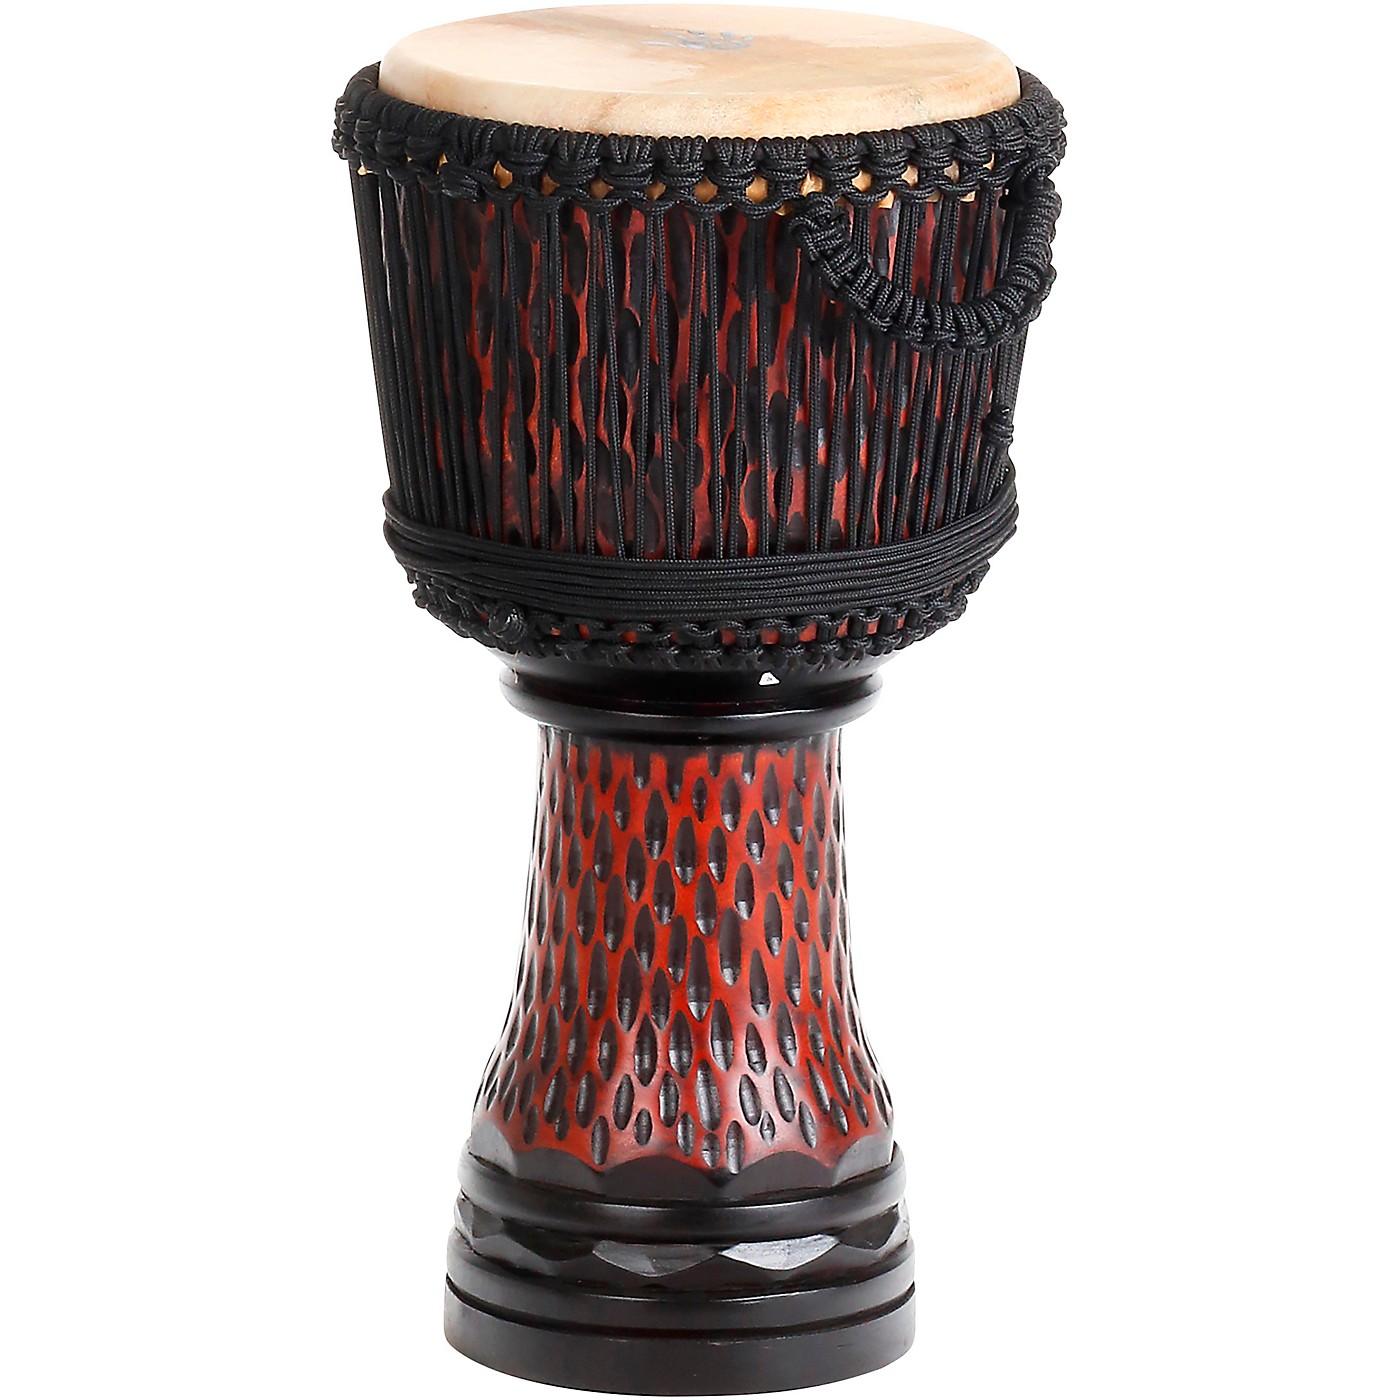 X8 Drums King Cheetah Elite Pro Djembe thumbnail